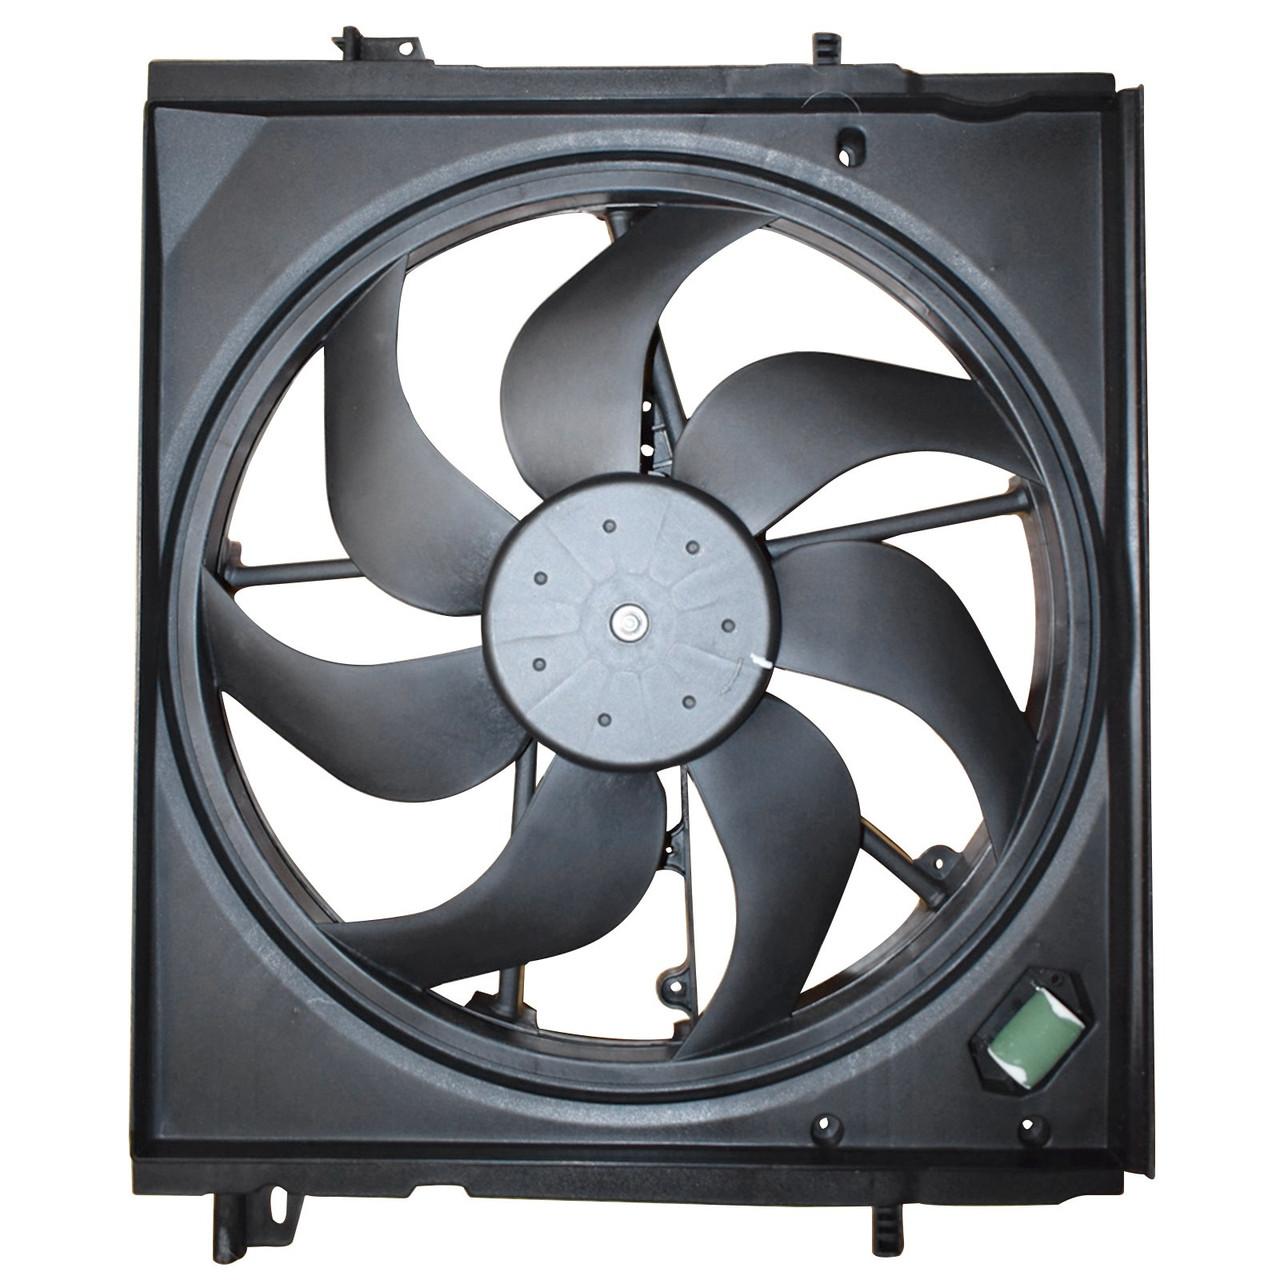 Nissan Rogue Sport 2.0L 2017-2019 Radiator Cooling Fan Assembly NI3115162 Generic